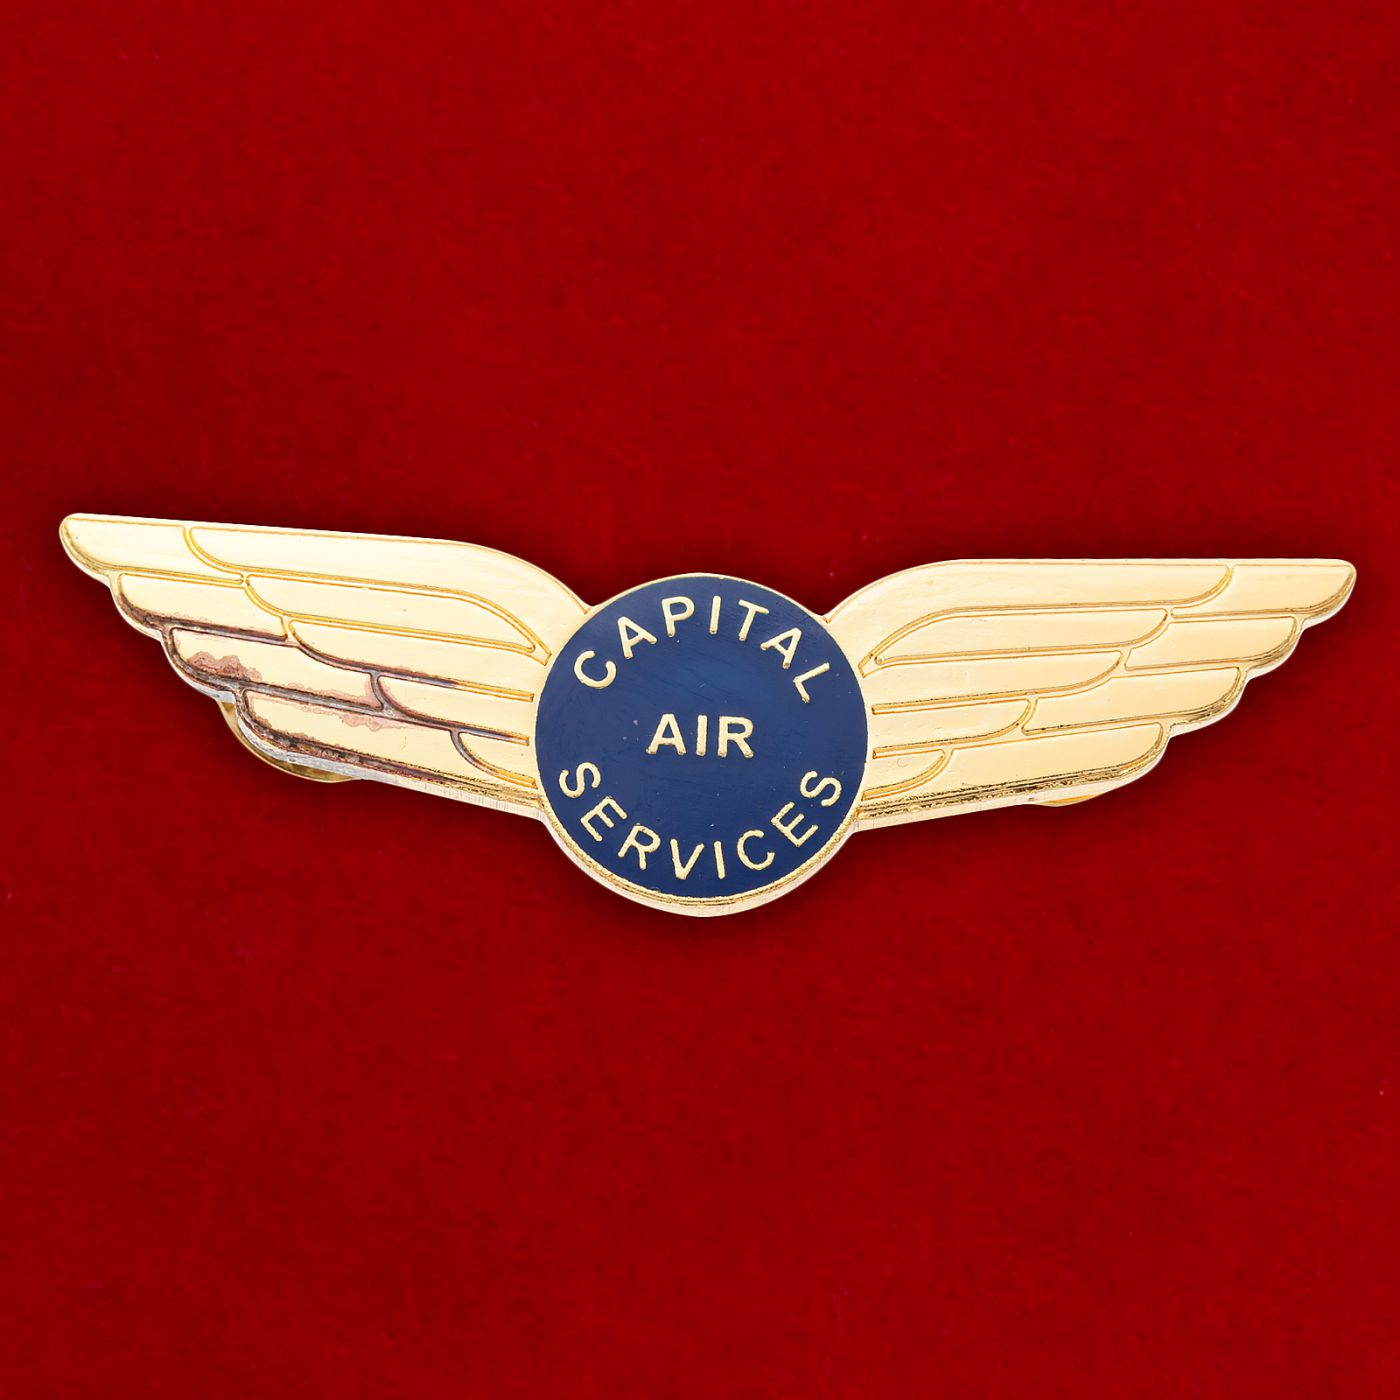 "Значок Компании ""Capital Air Services"""